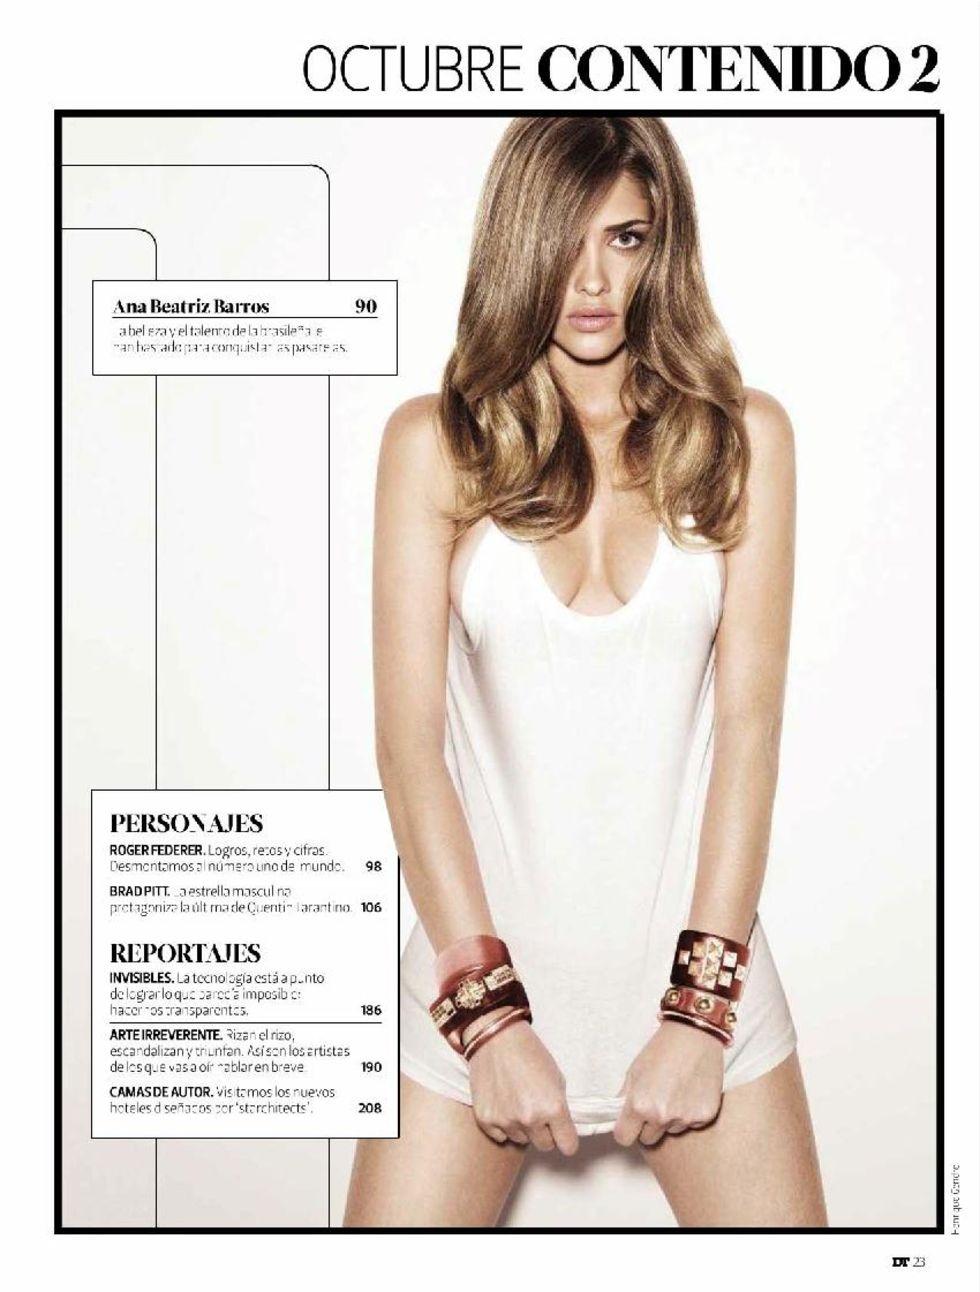 ana-beatriz-barros-dt-magazine-october-2009-02